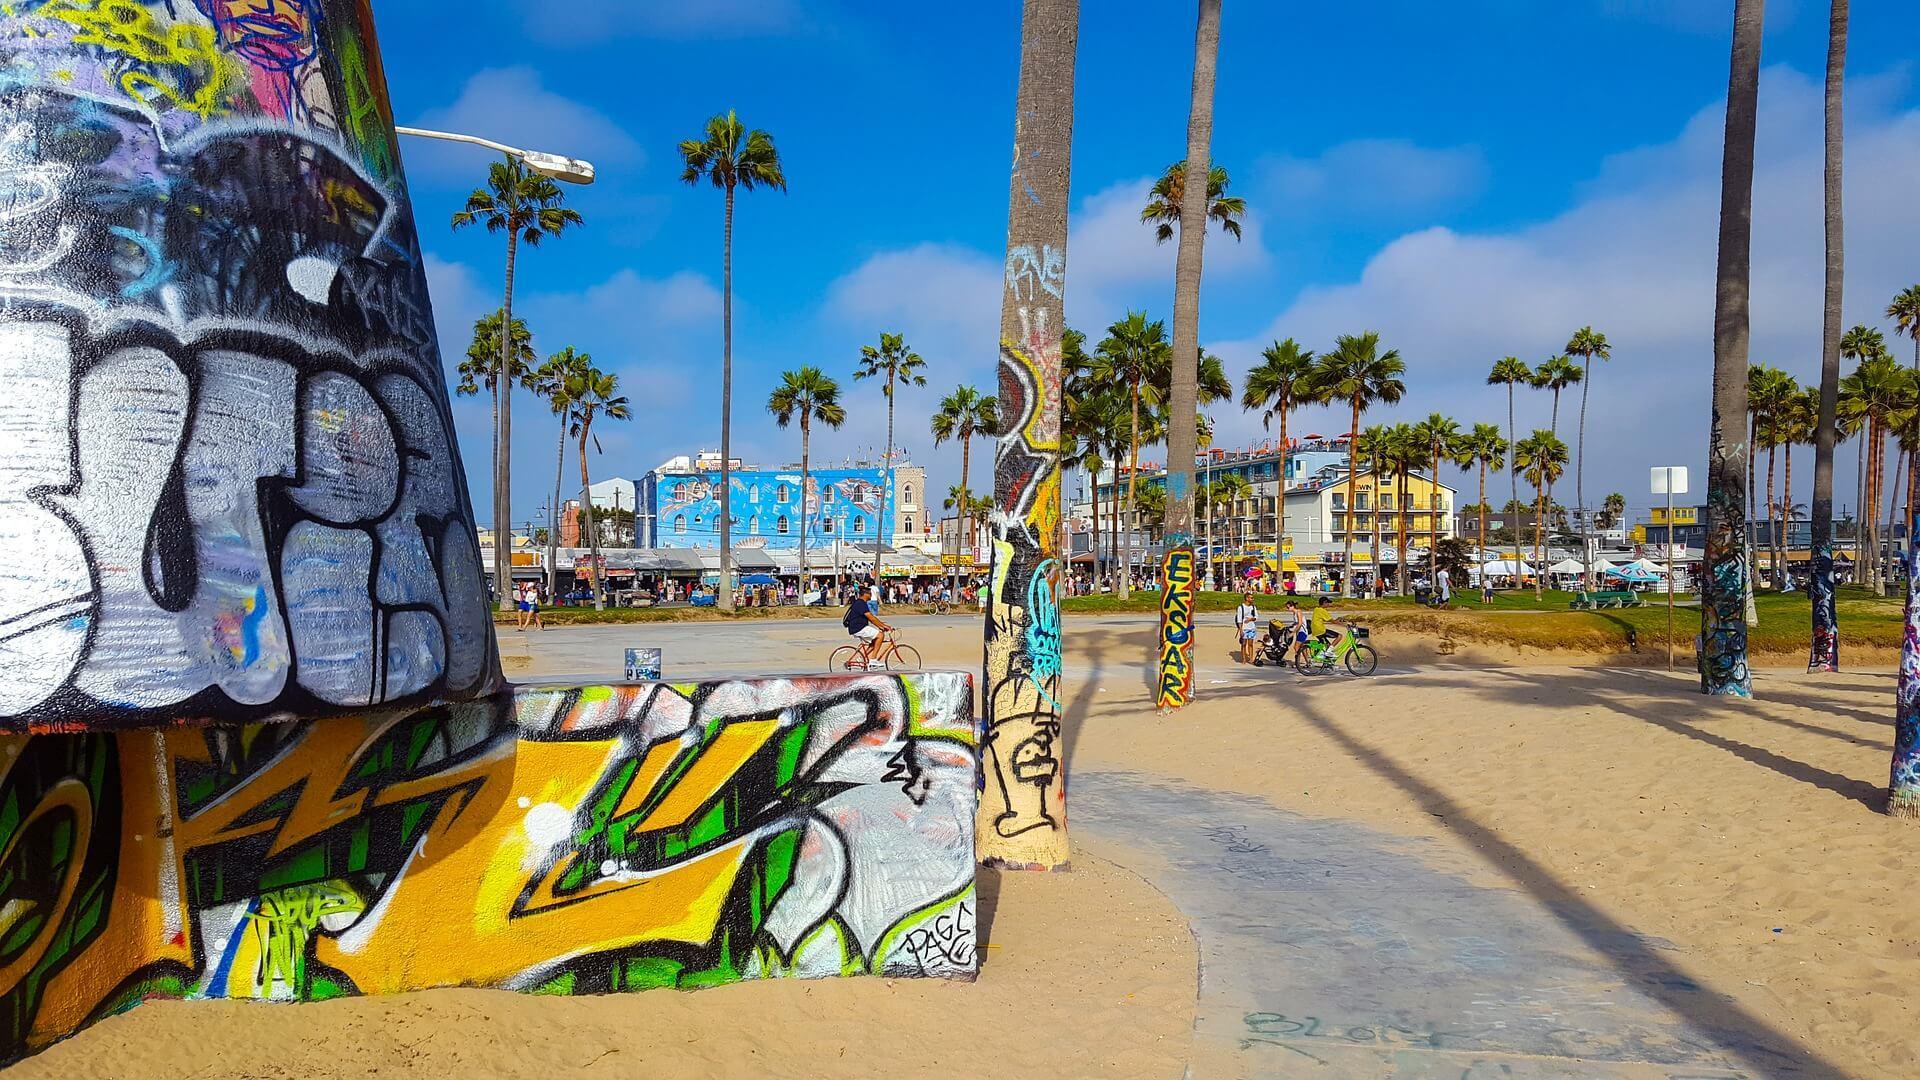 The Venice Beach Boardwalk, Los Angeles